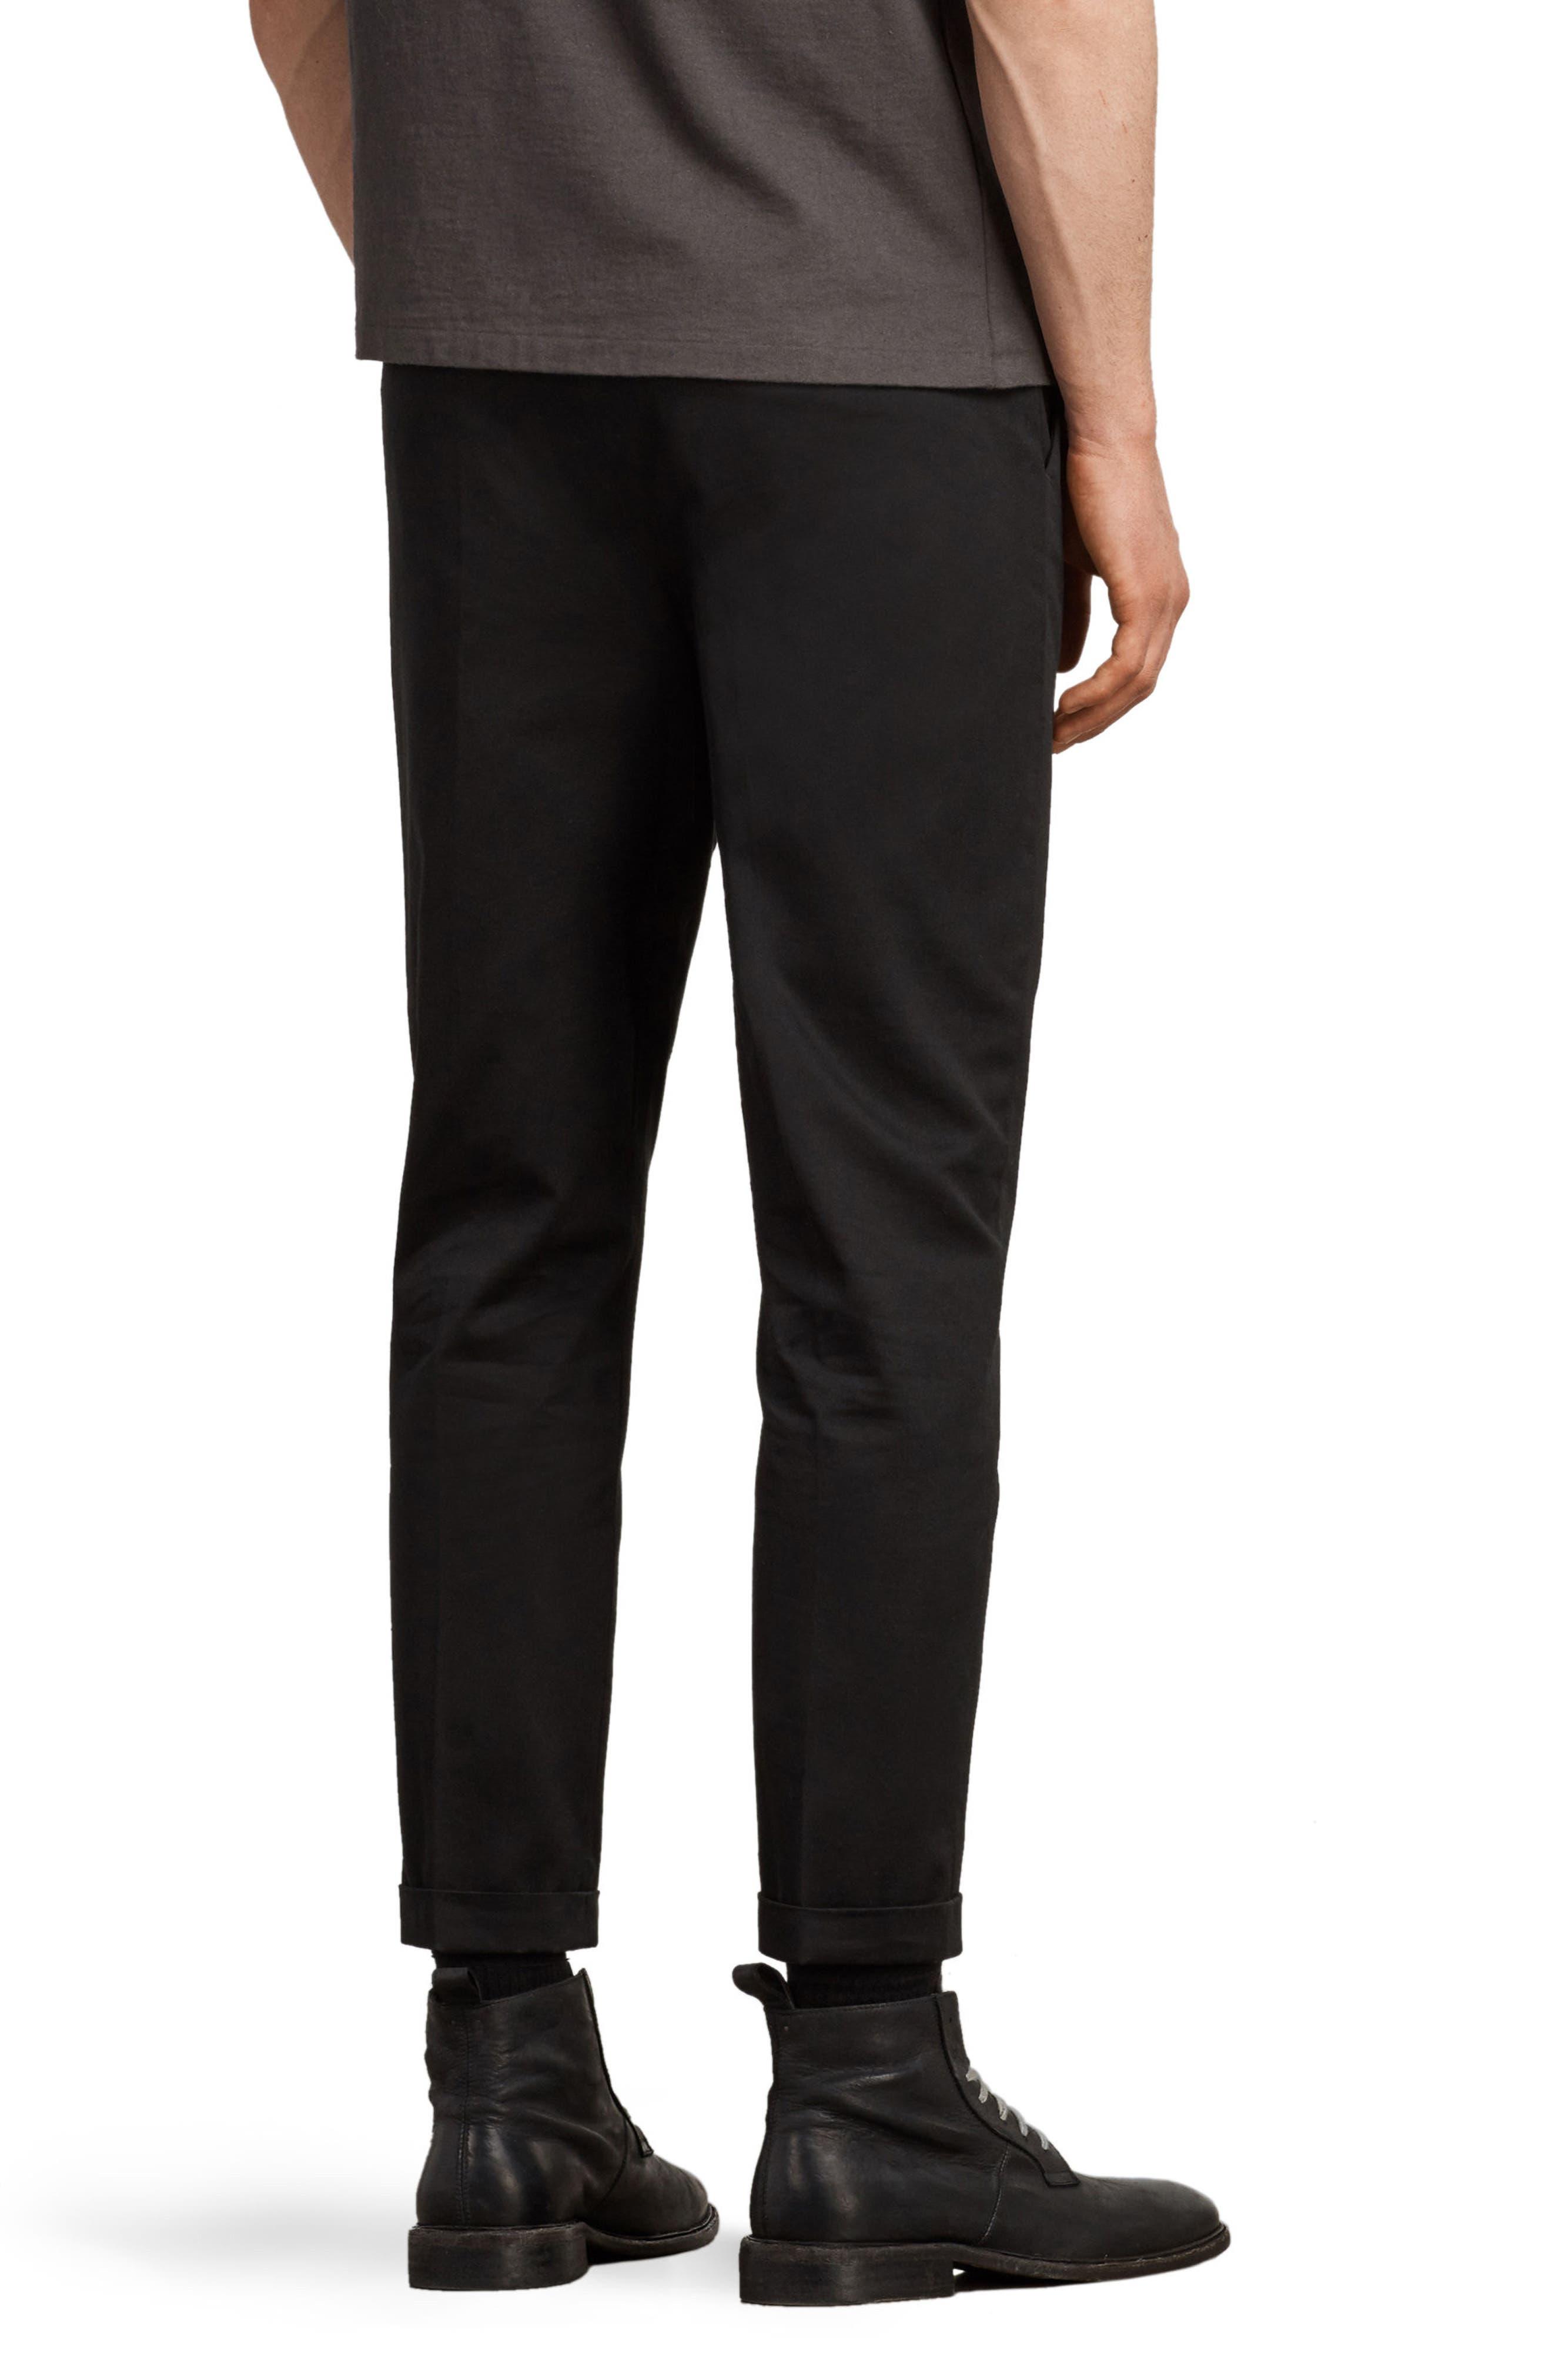 Salco Slim Fit Chino Pants,                             Alternate thumbnail 2, color,                             Black